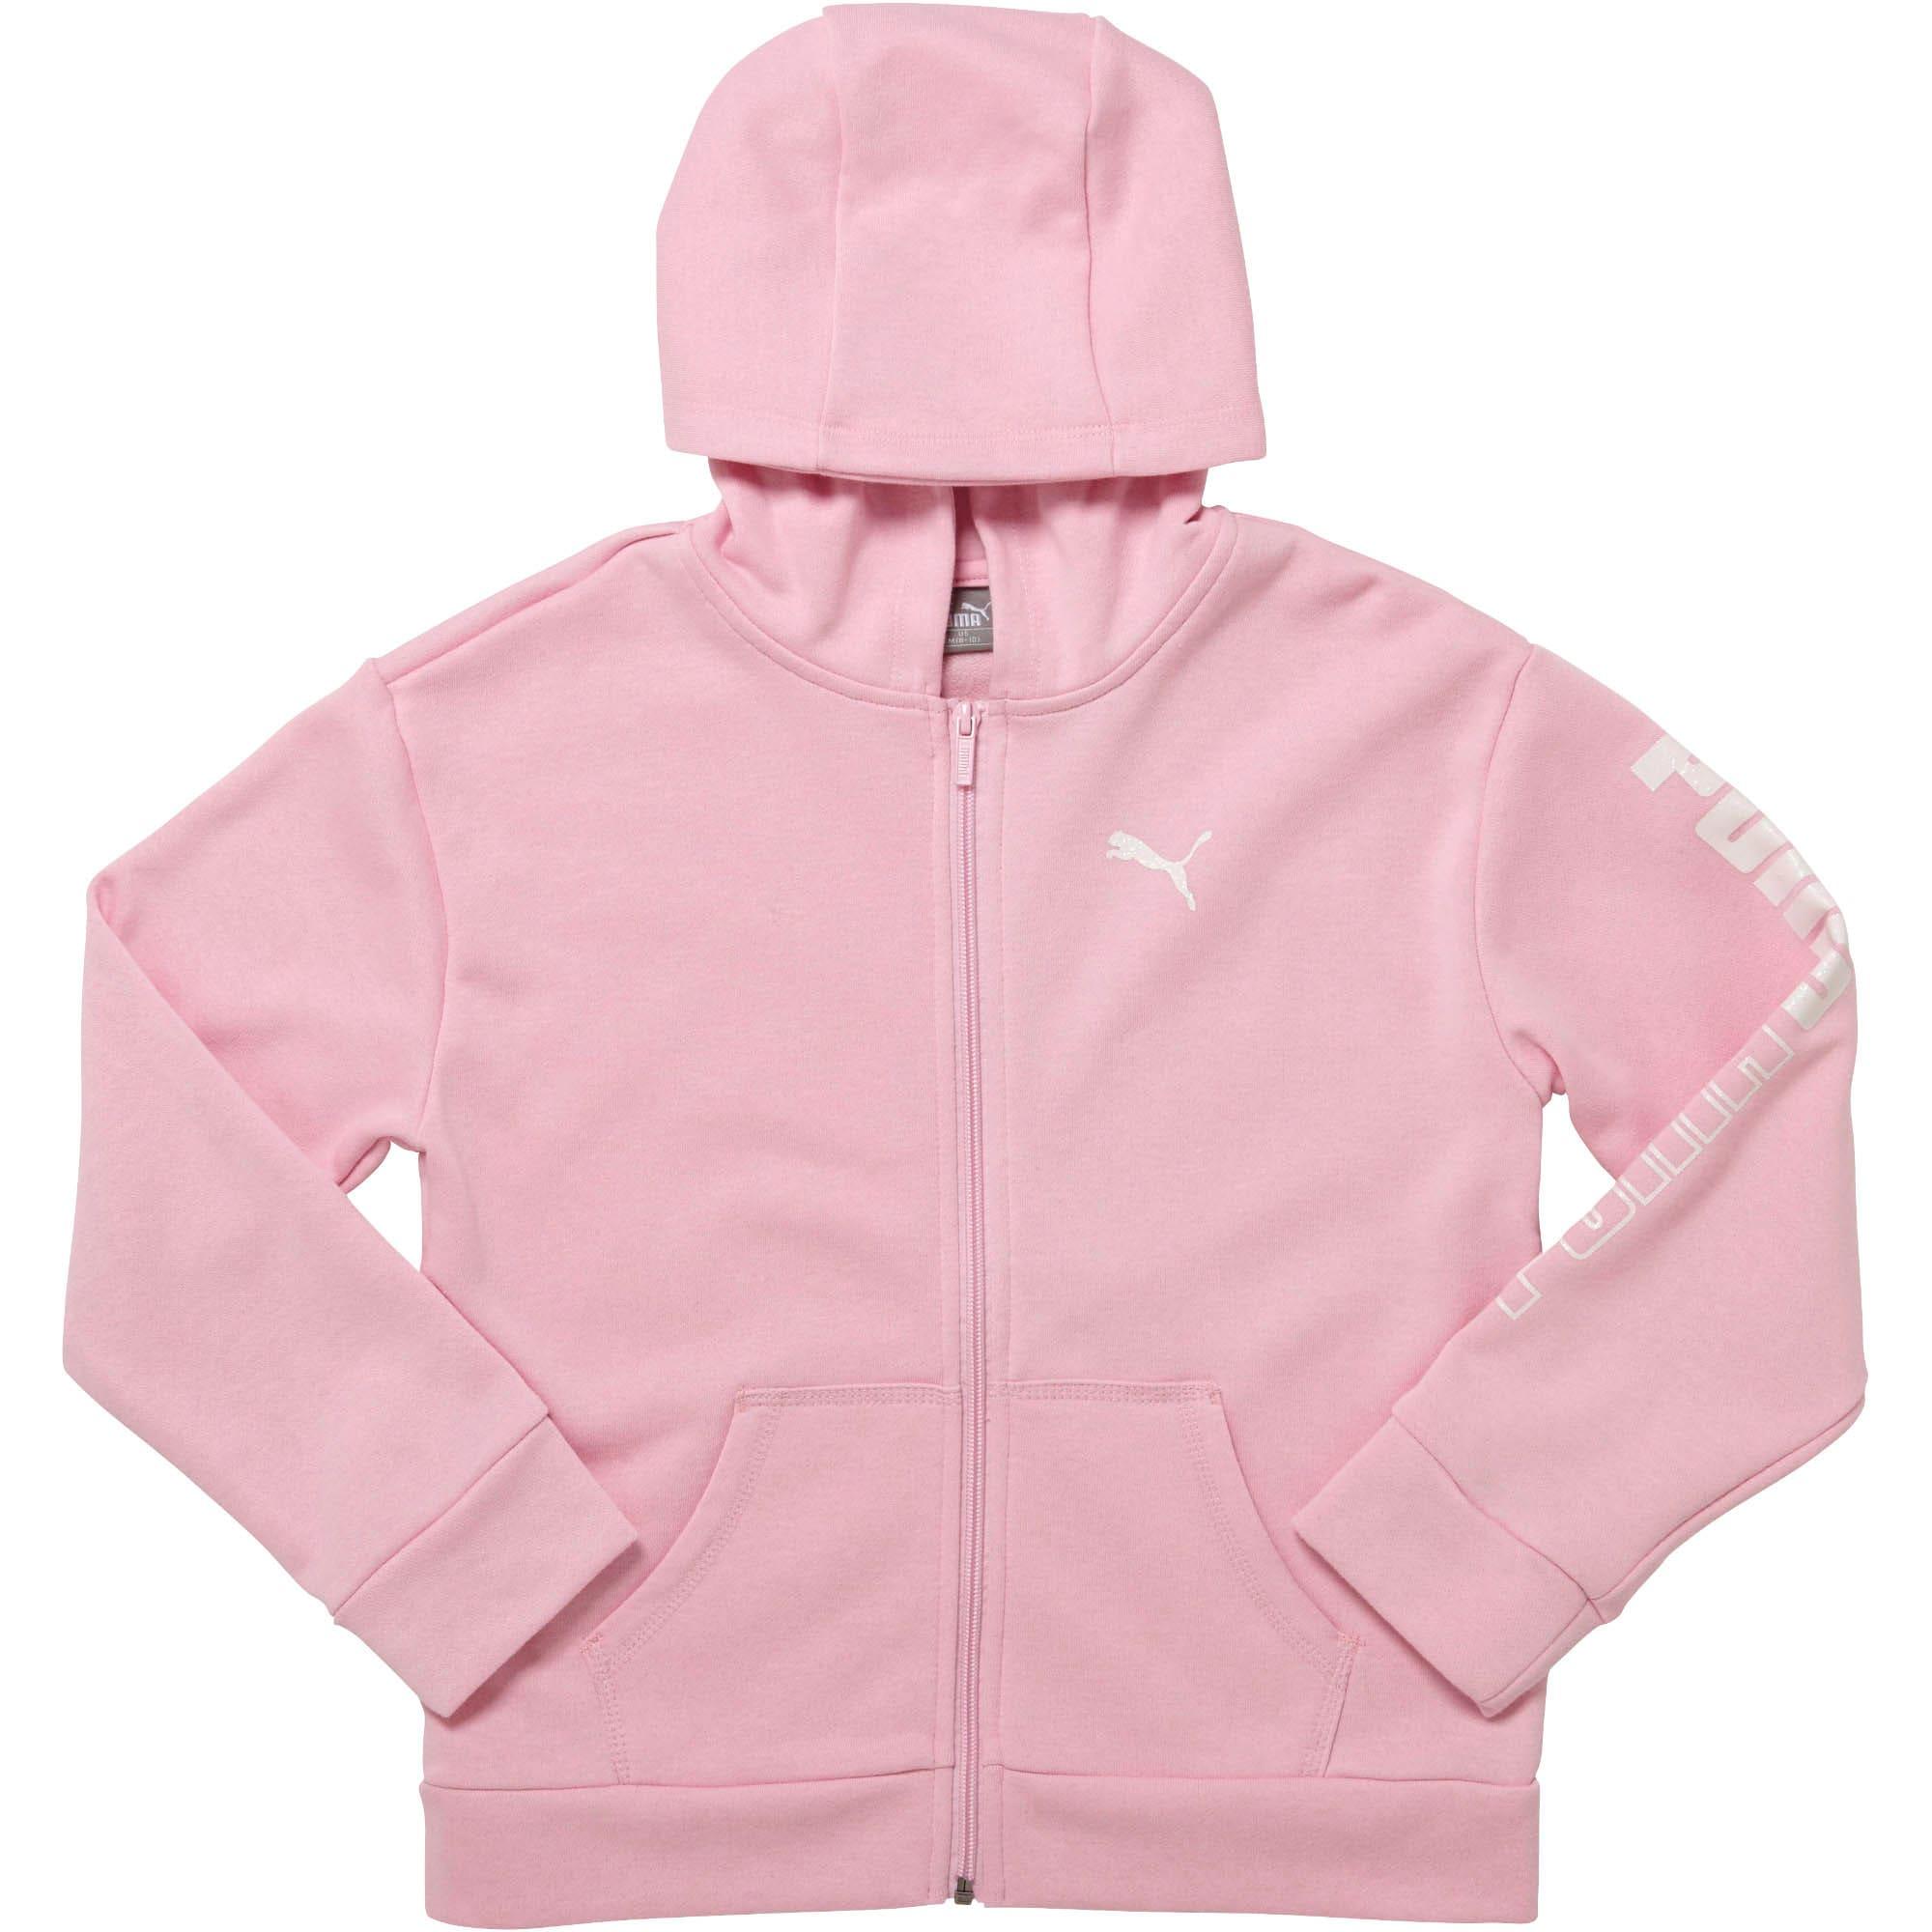 Thumbnail 1 of Girls' Fleece Full Zip Hoodie JR, PALE PINK, medium